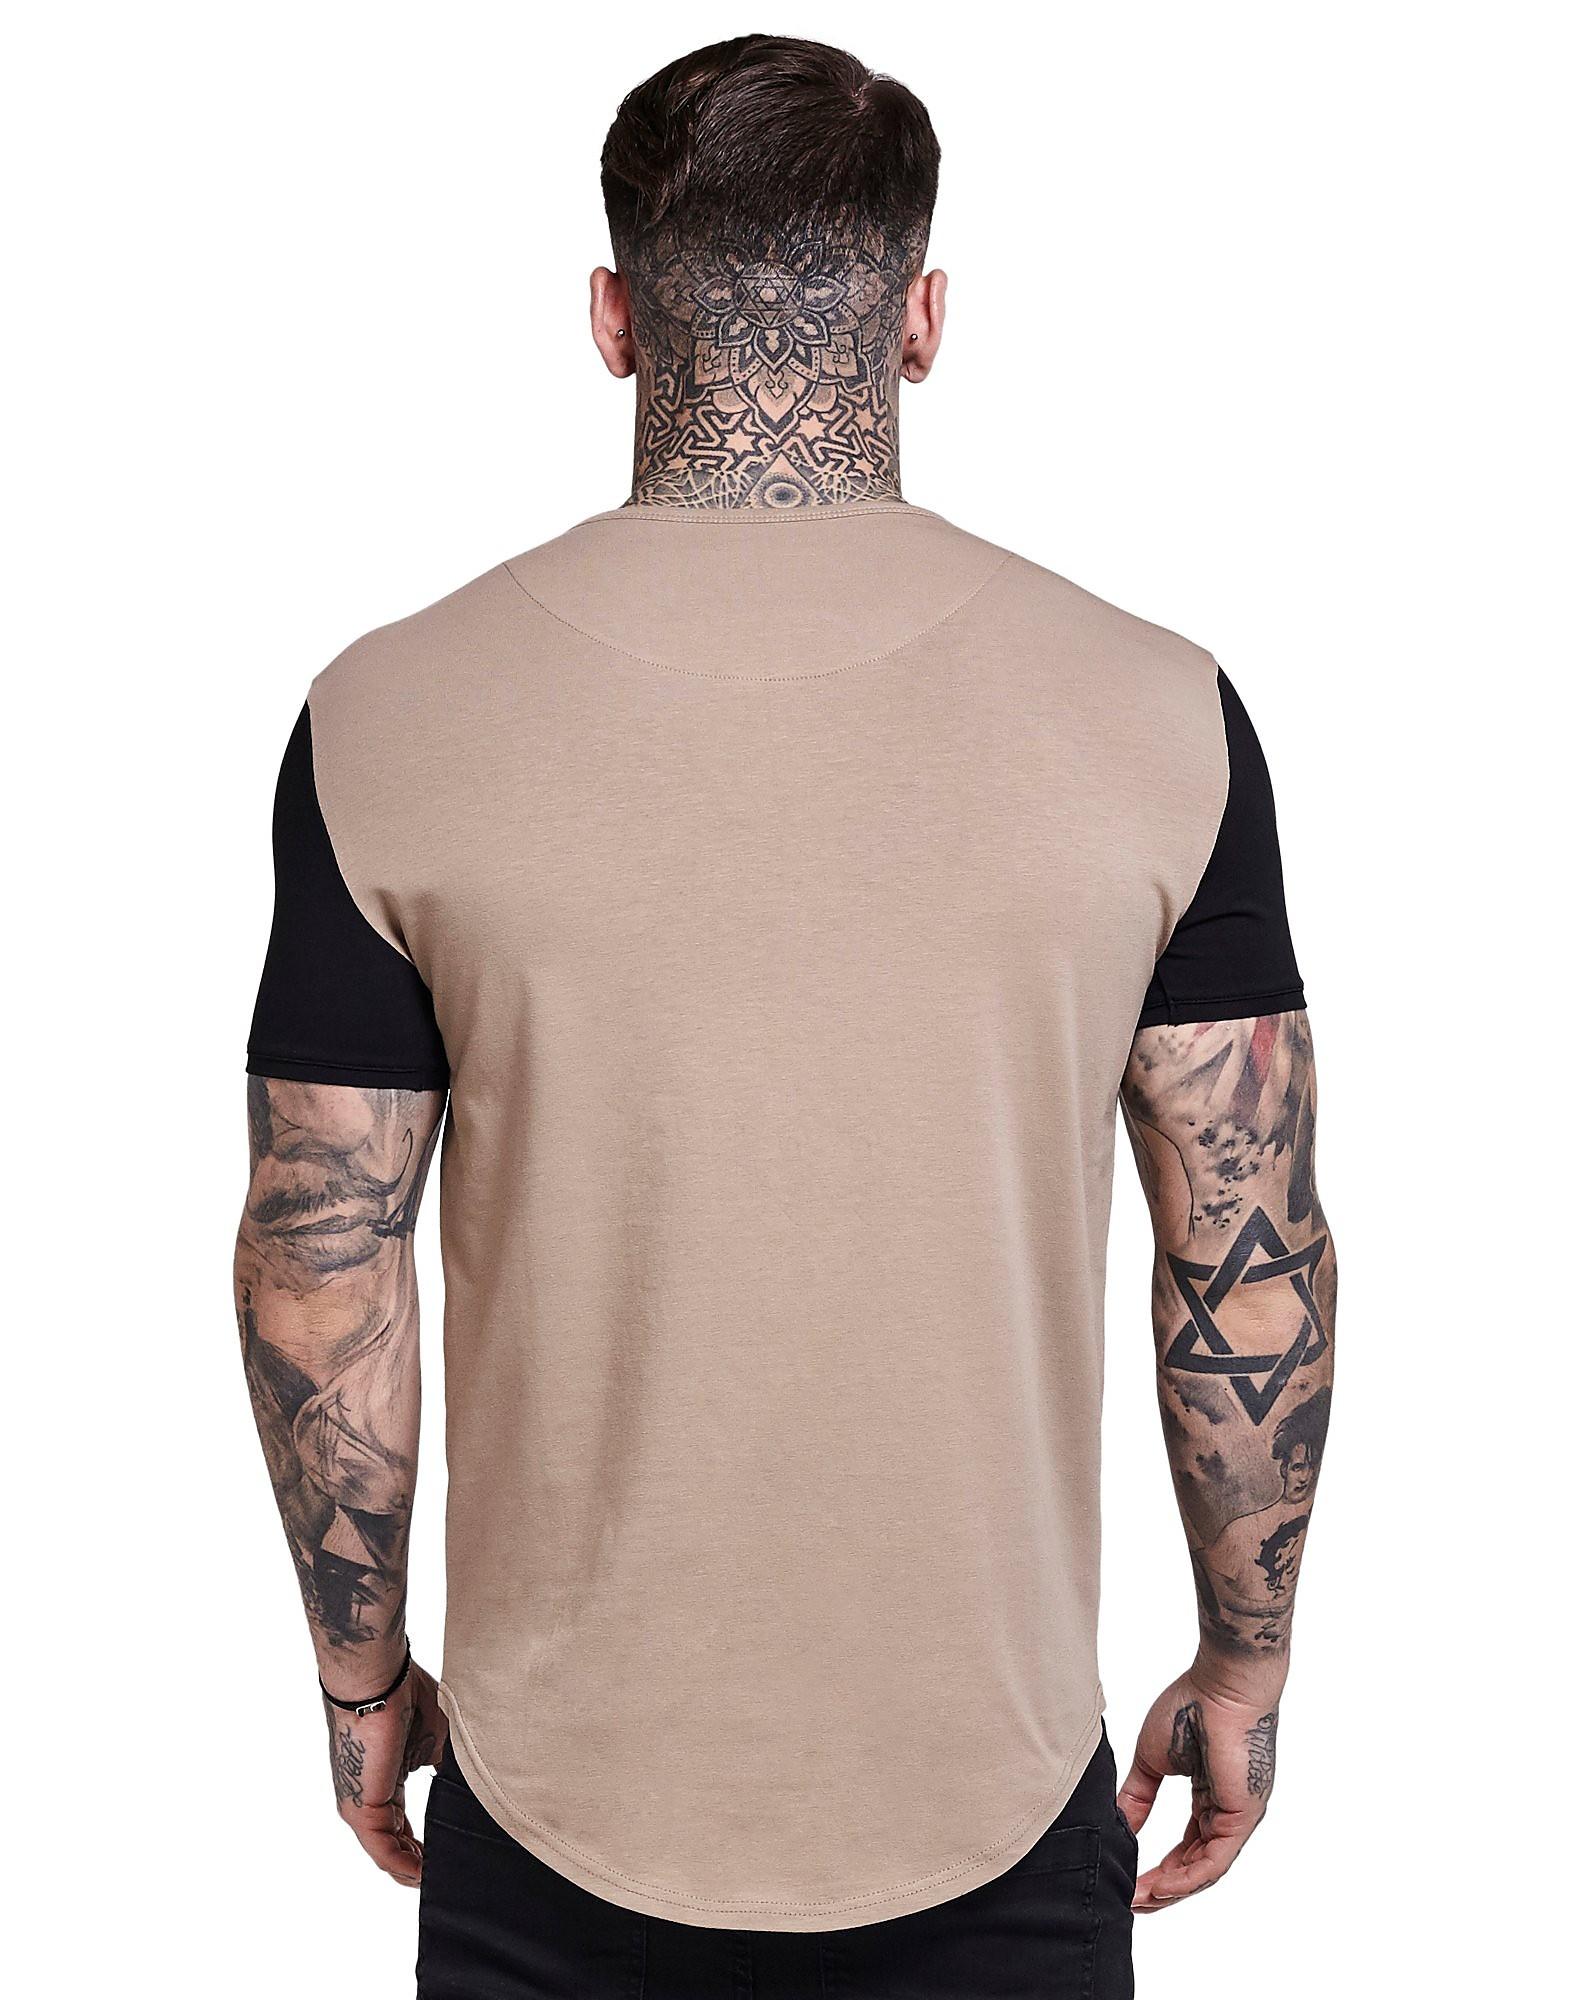 SikSilk T-shirt Contrast